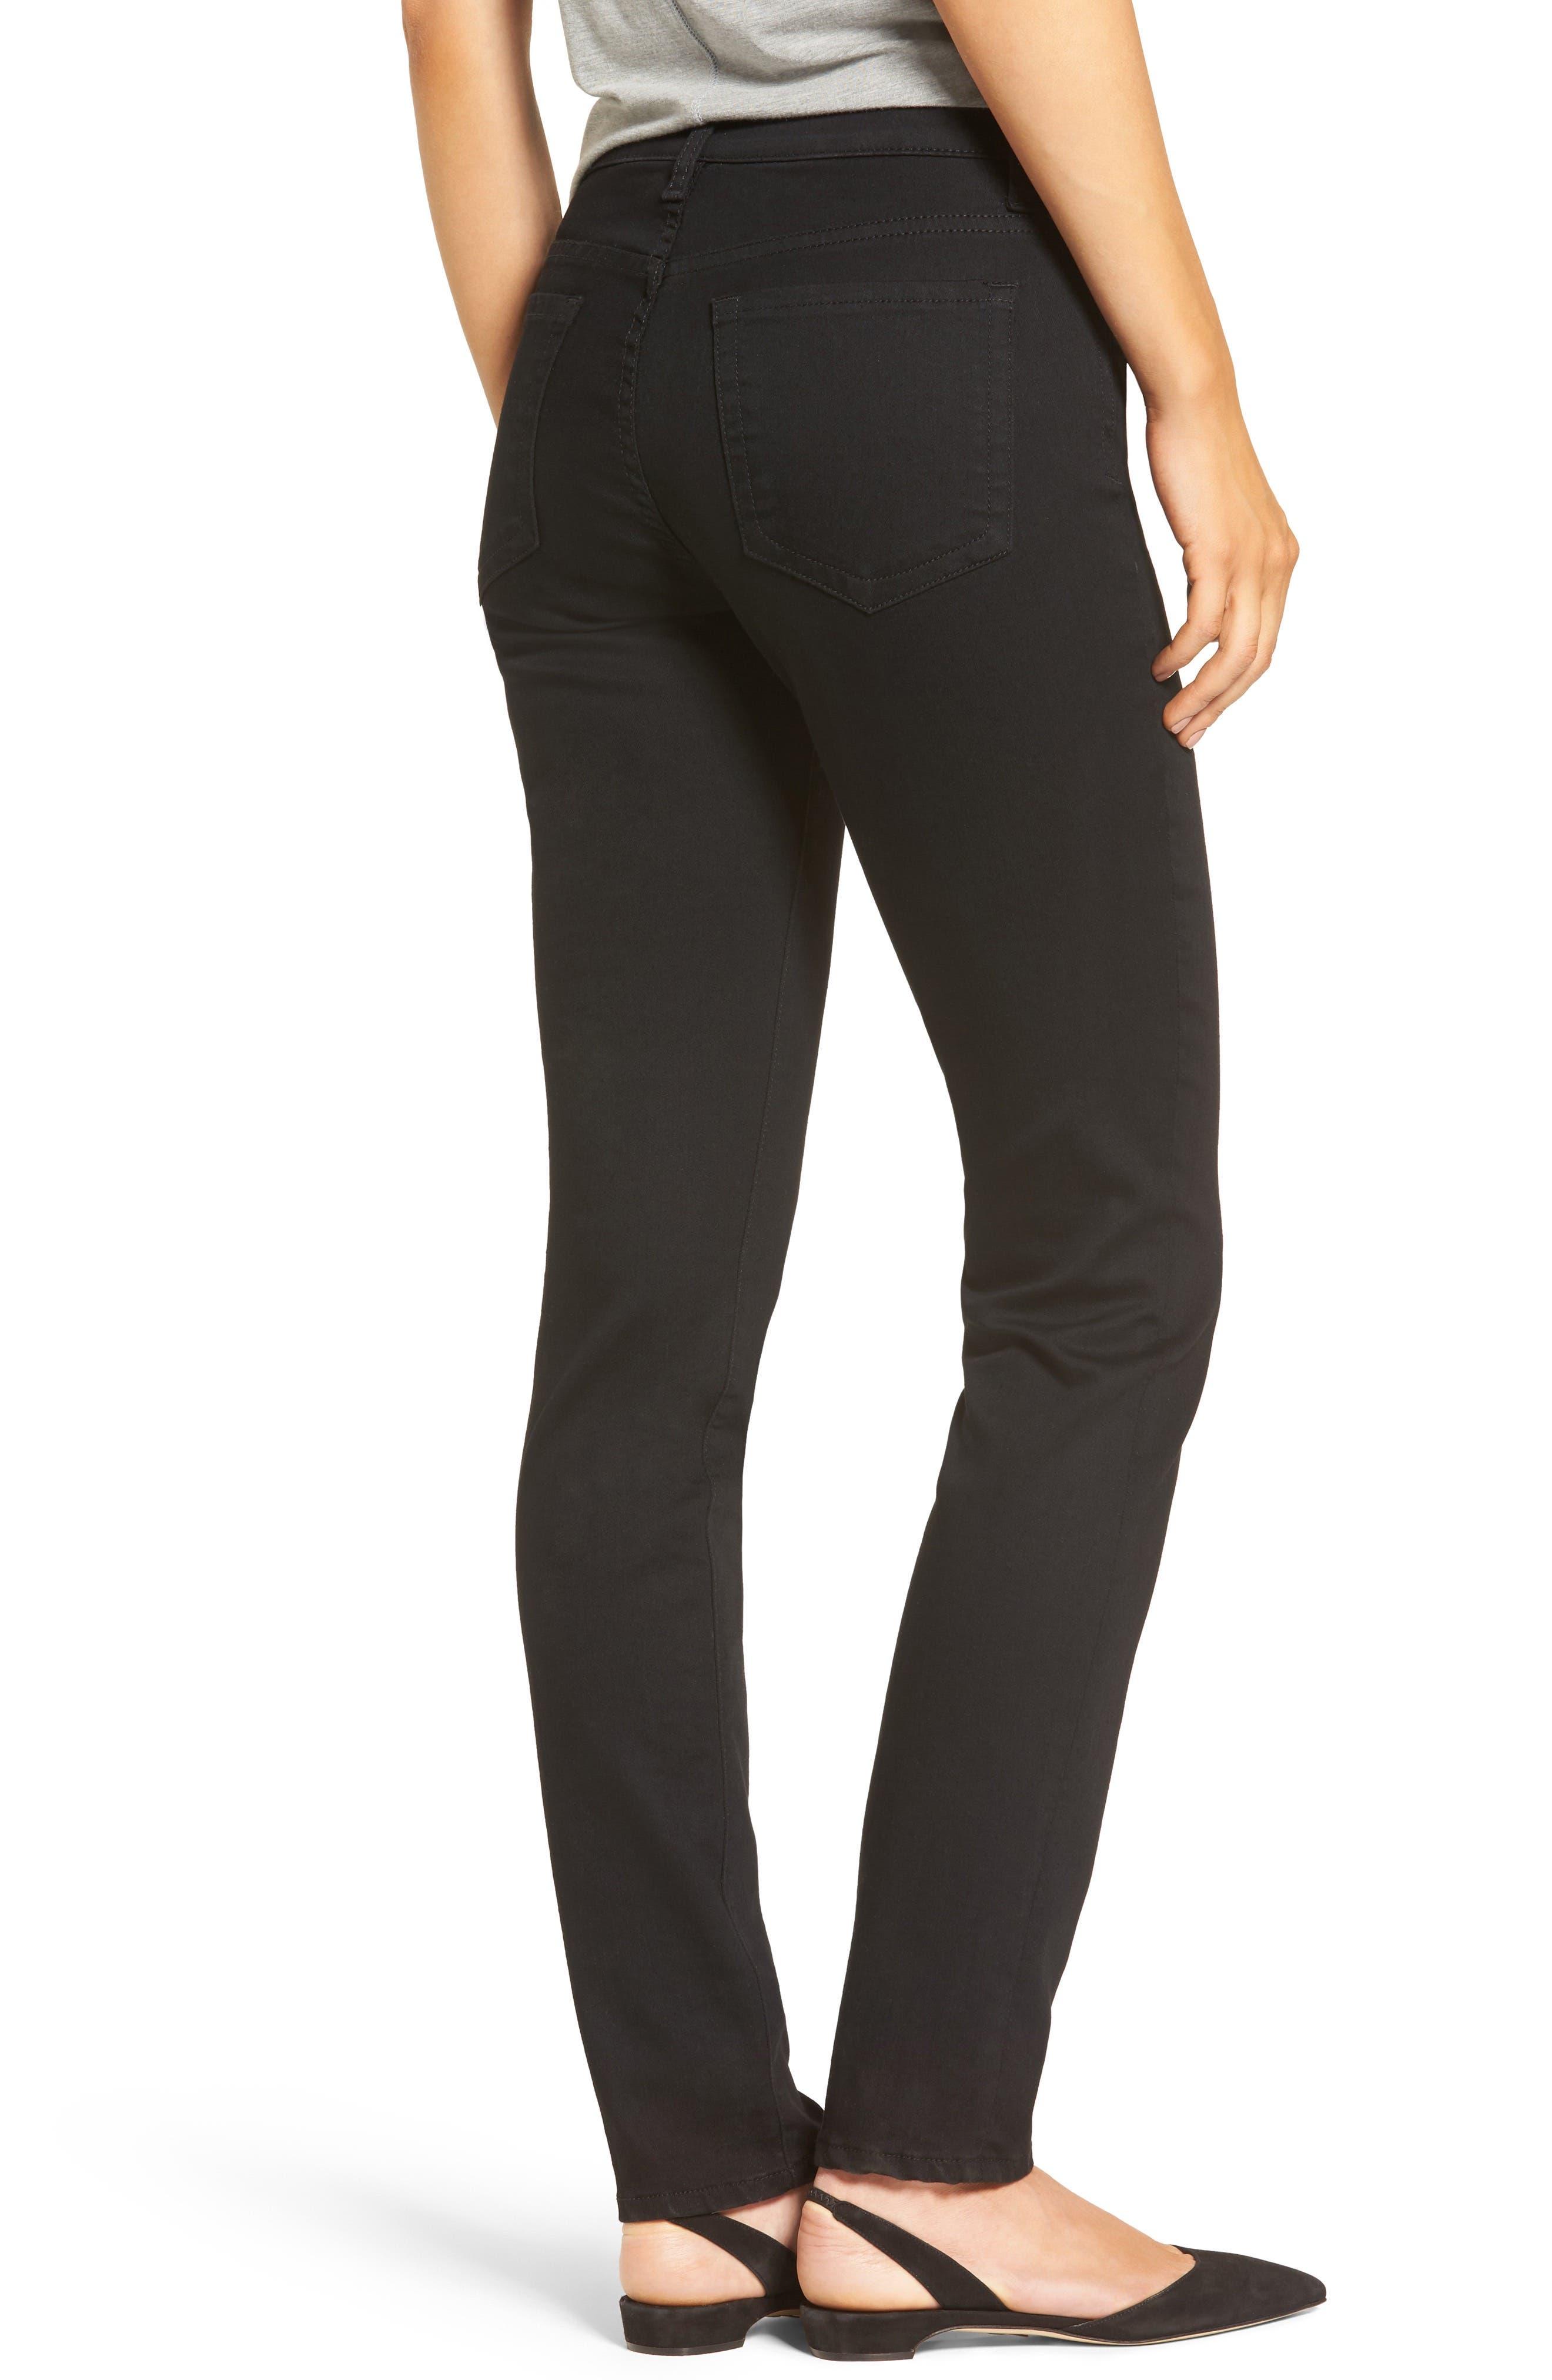 Alternate Image 2  - KUT from the Kloth Diana Stretch Skinny Jeans (Regular & Petite)